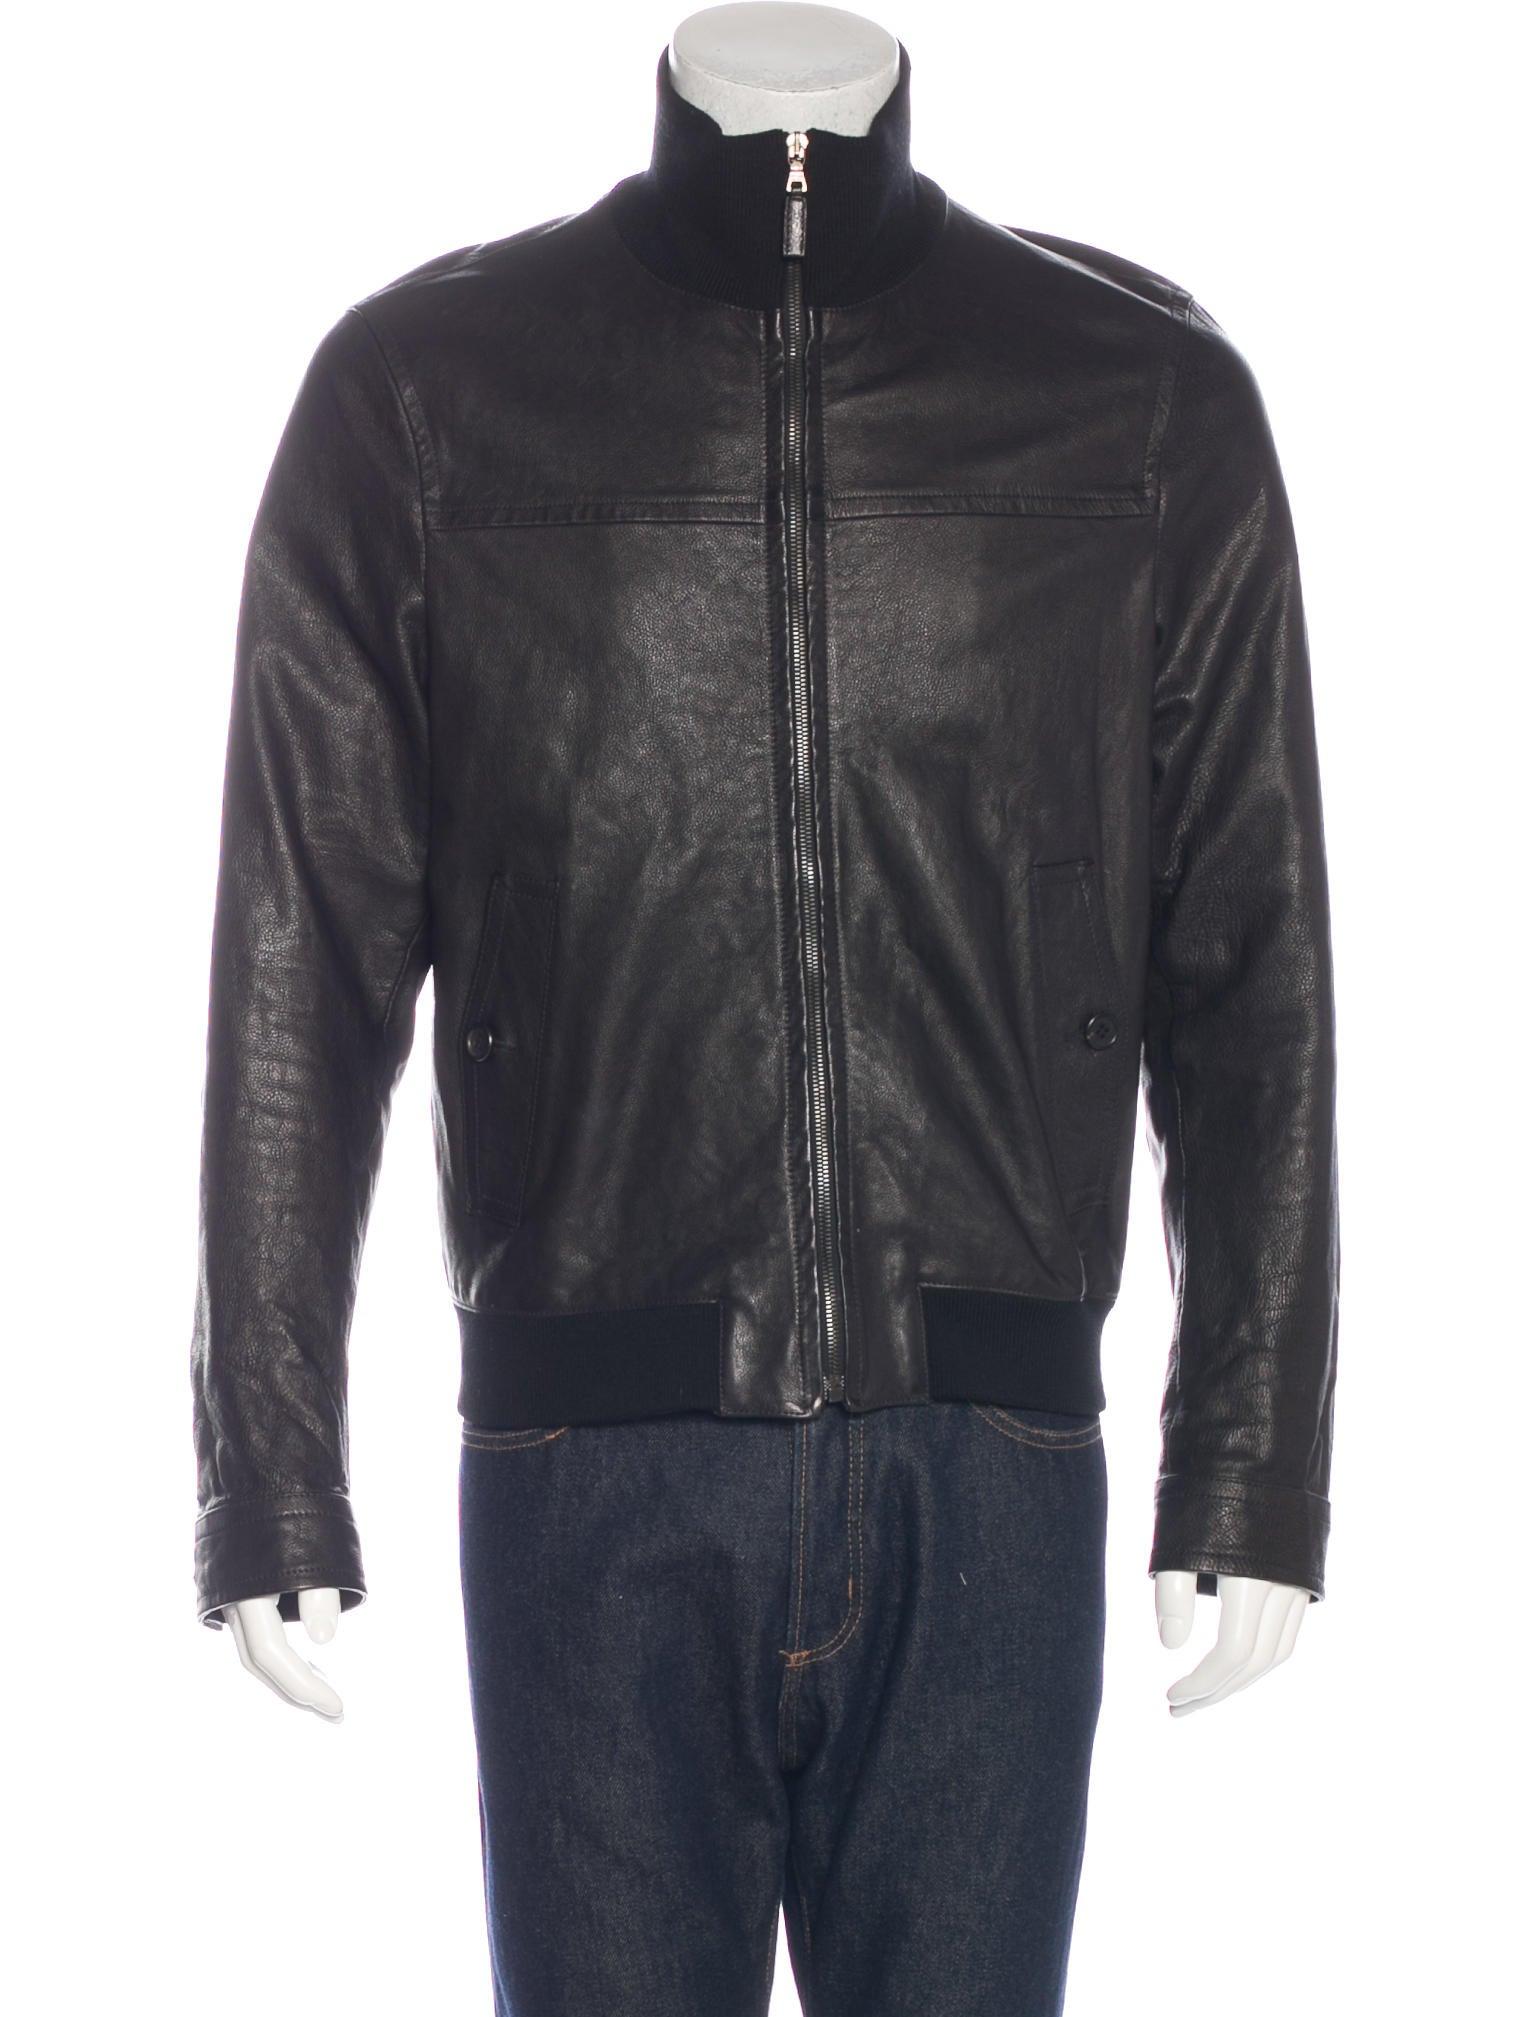 Prada leather jackets